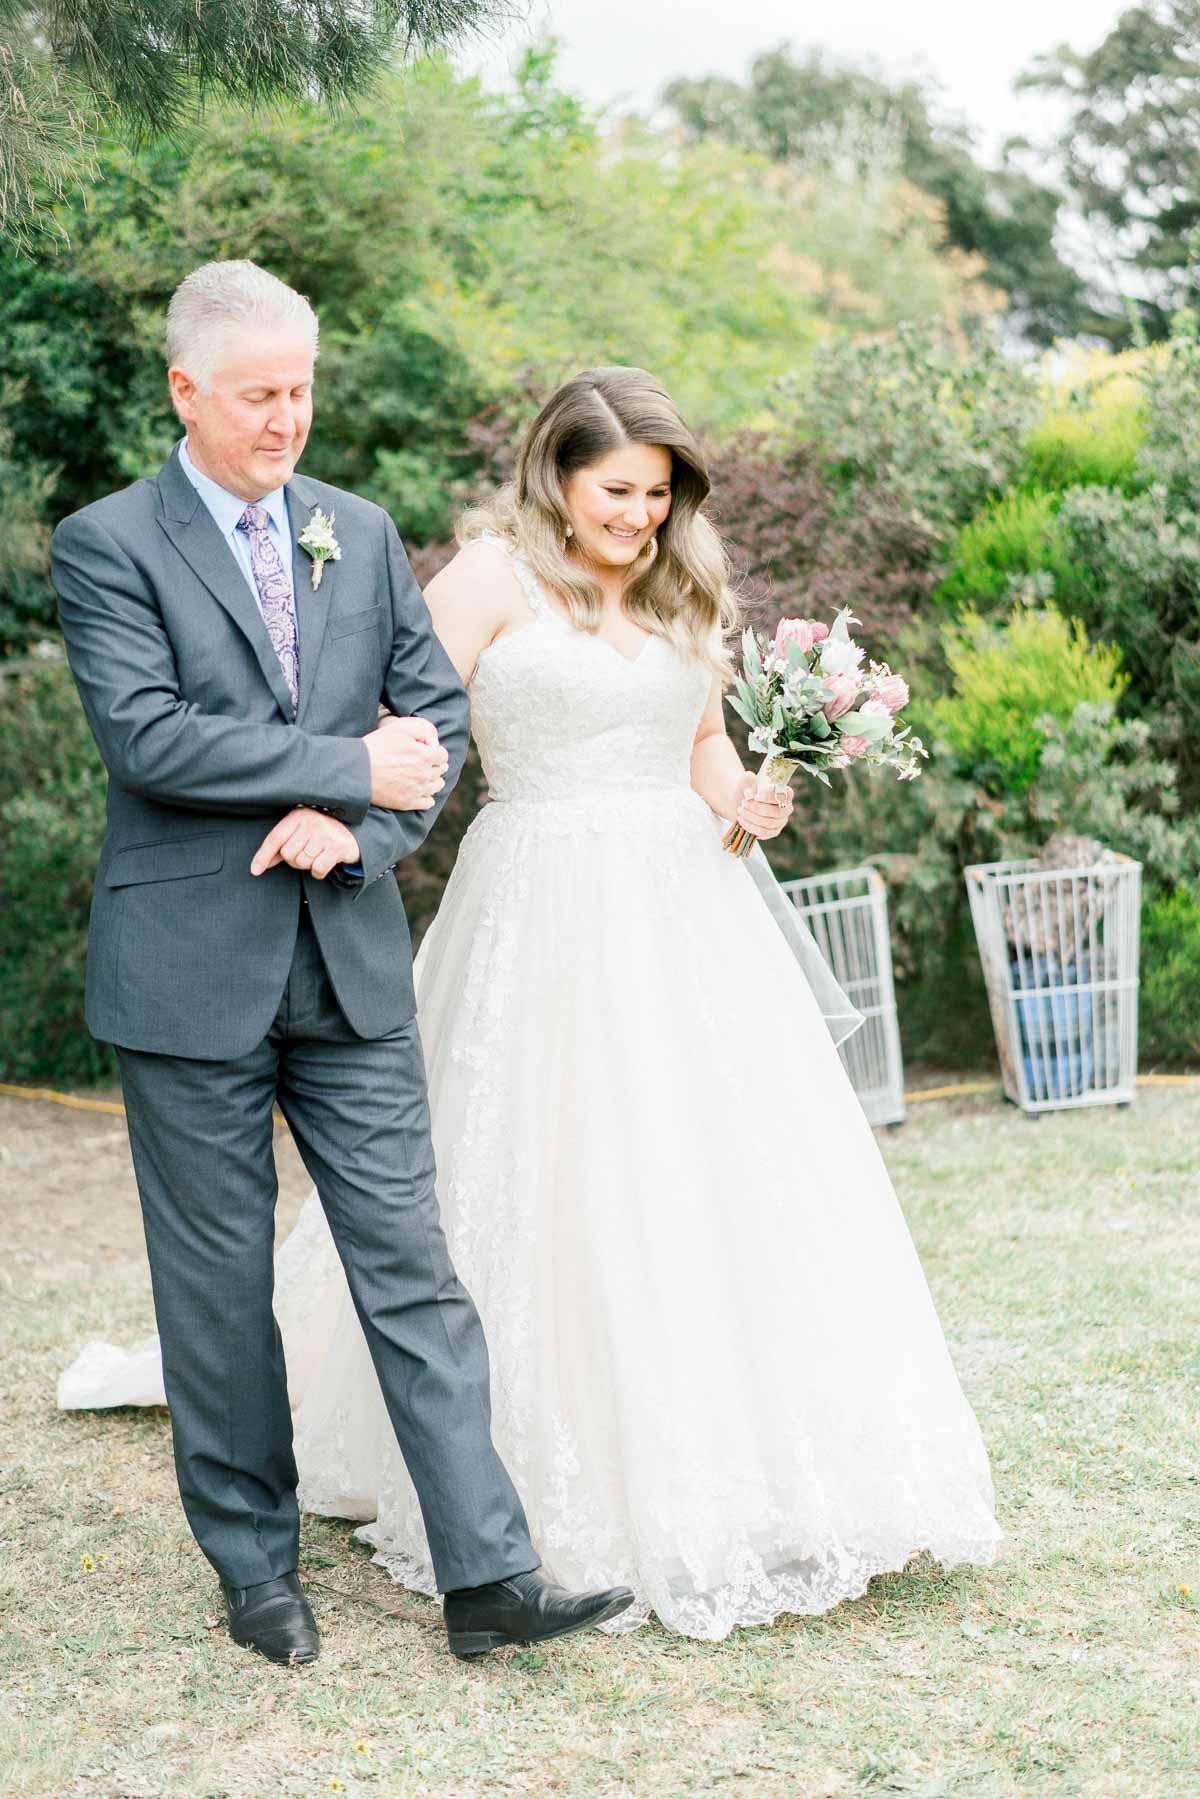 adams-farm-coldstream-yarra-valley-wedding-heart+soul-weddings-kel-jarryd-04808.jpg